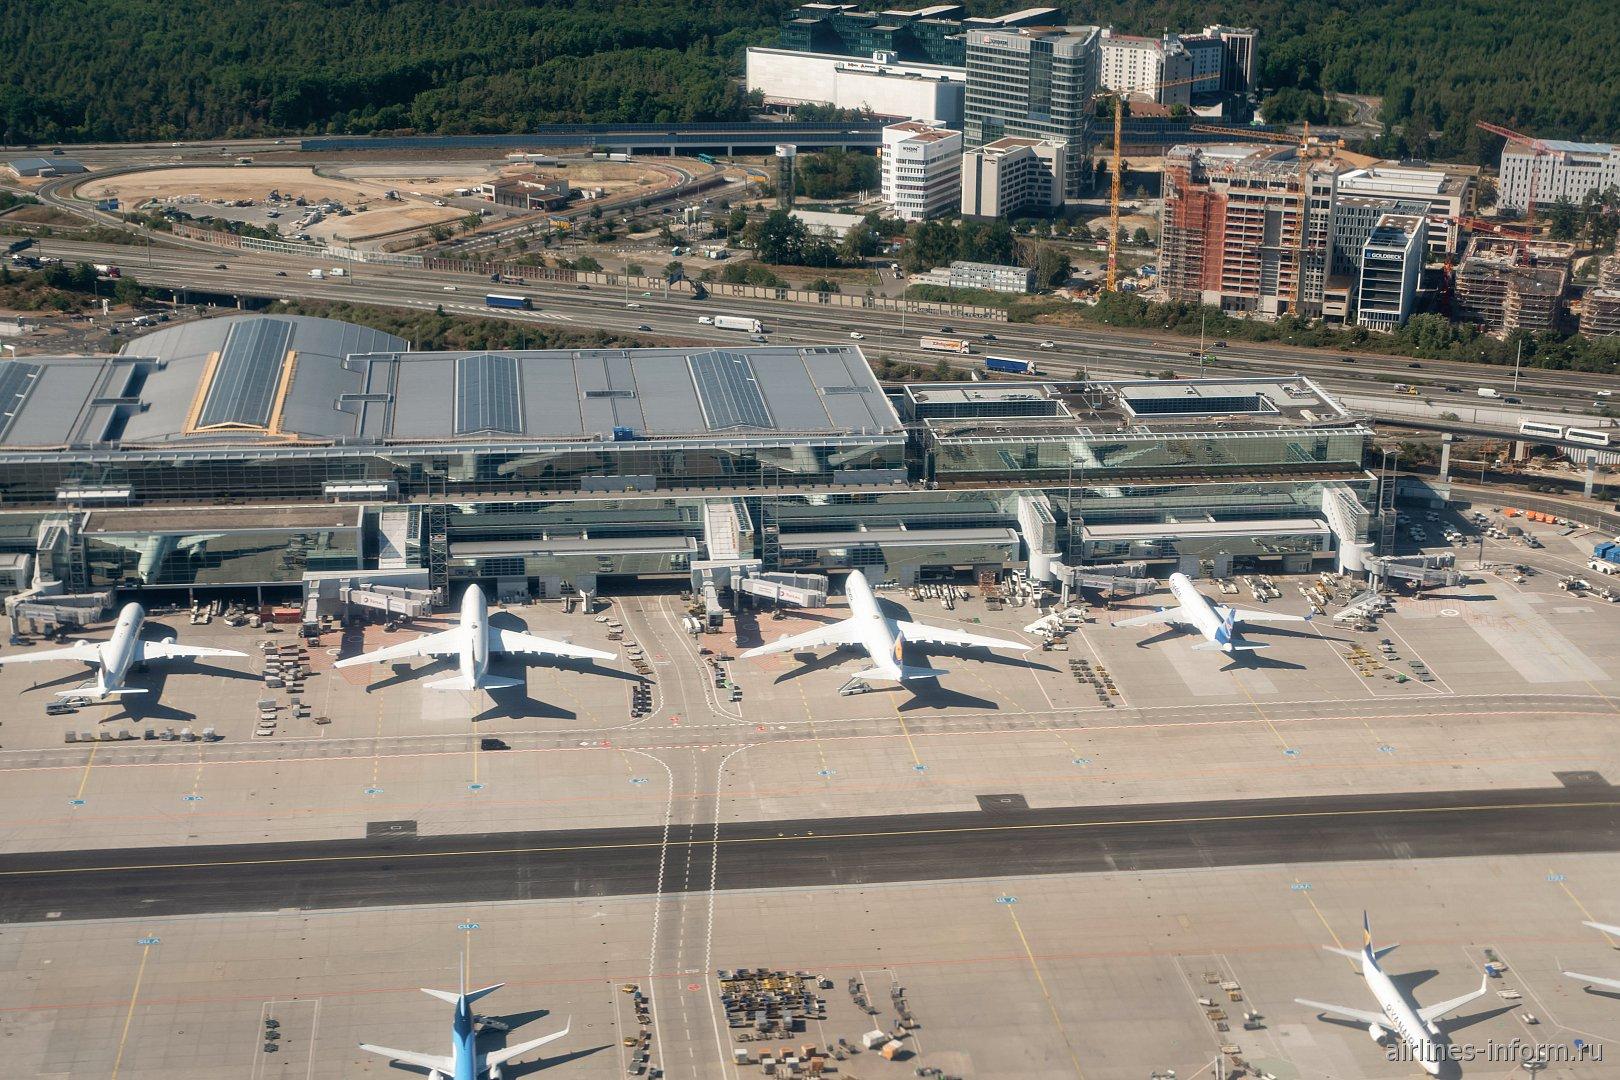 Взлет над терминалом 2 аэропорта Франкфурт